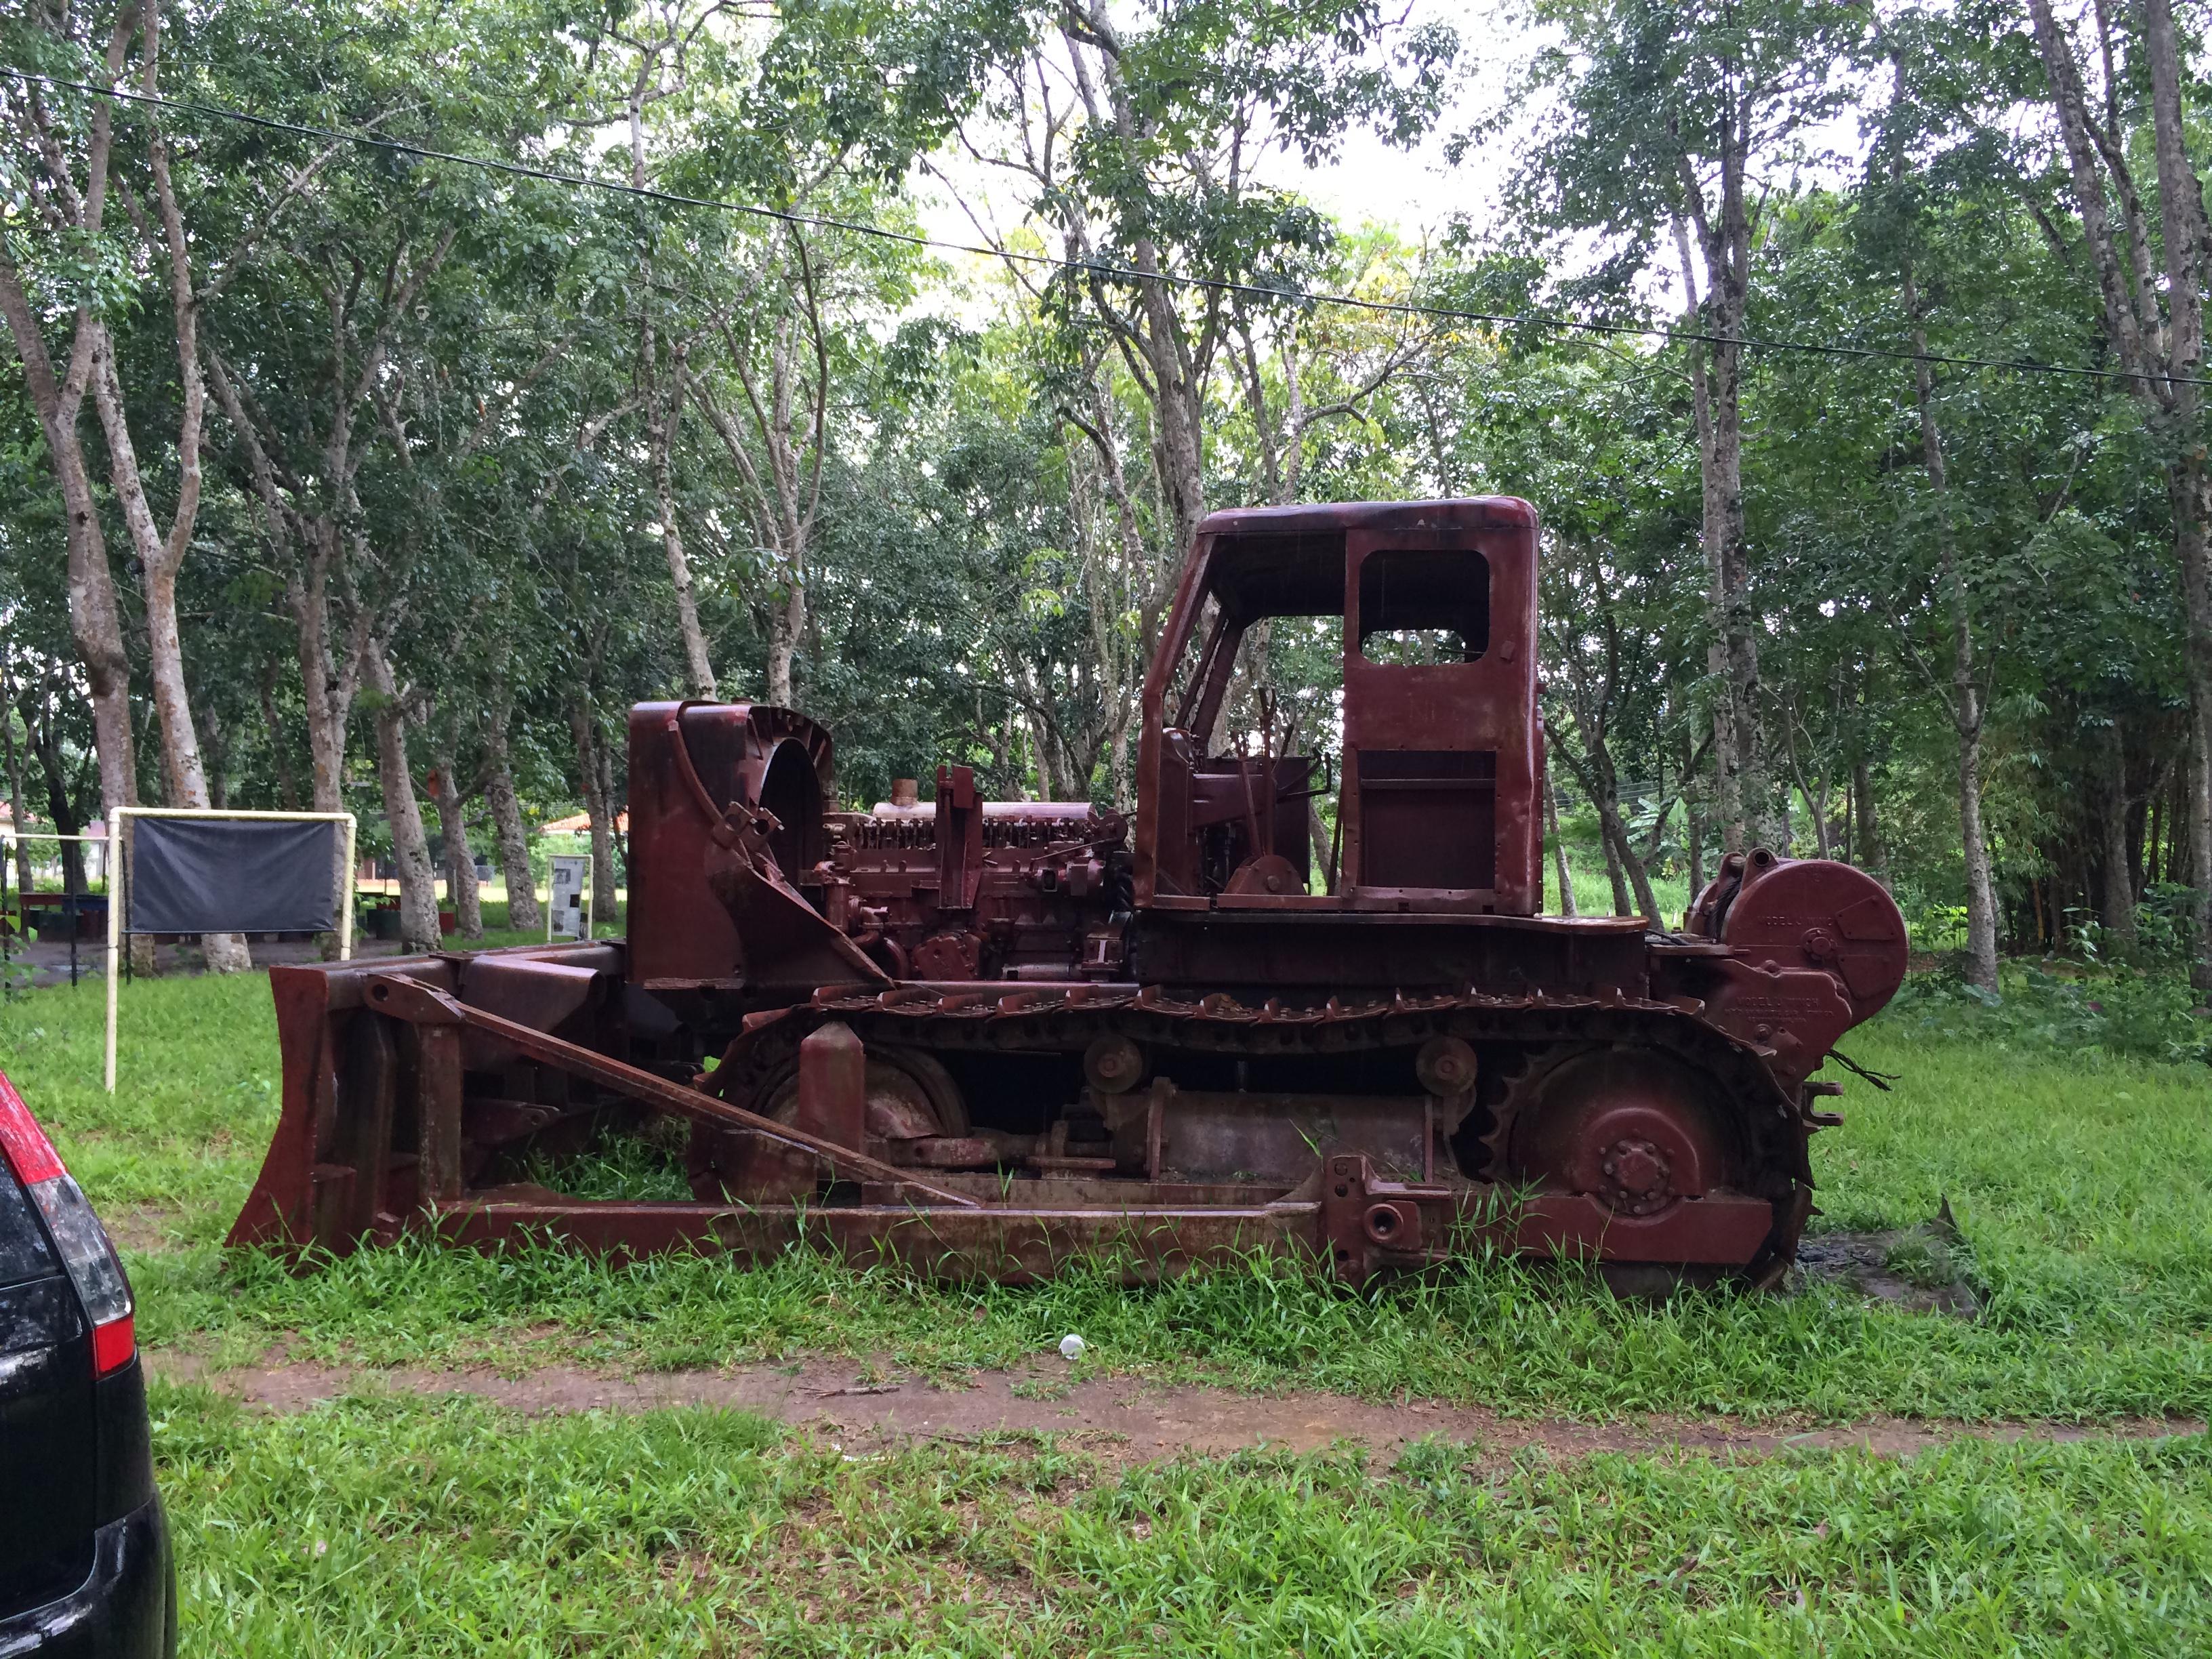 GM Bulldozer in Henry Ford's Belterra